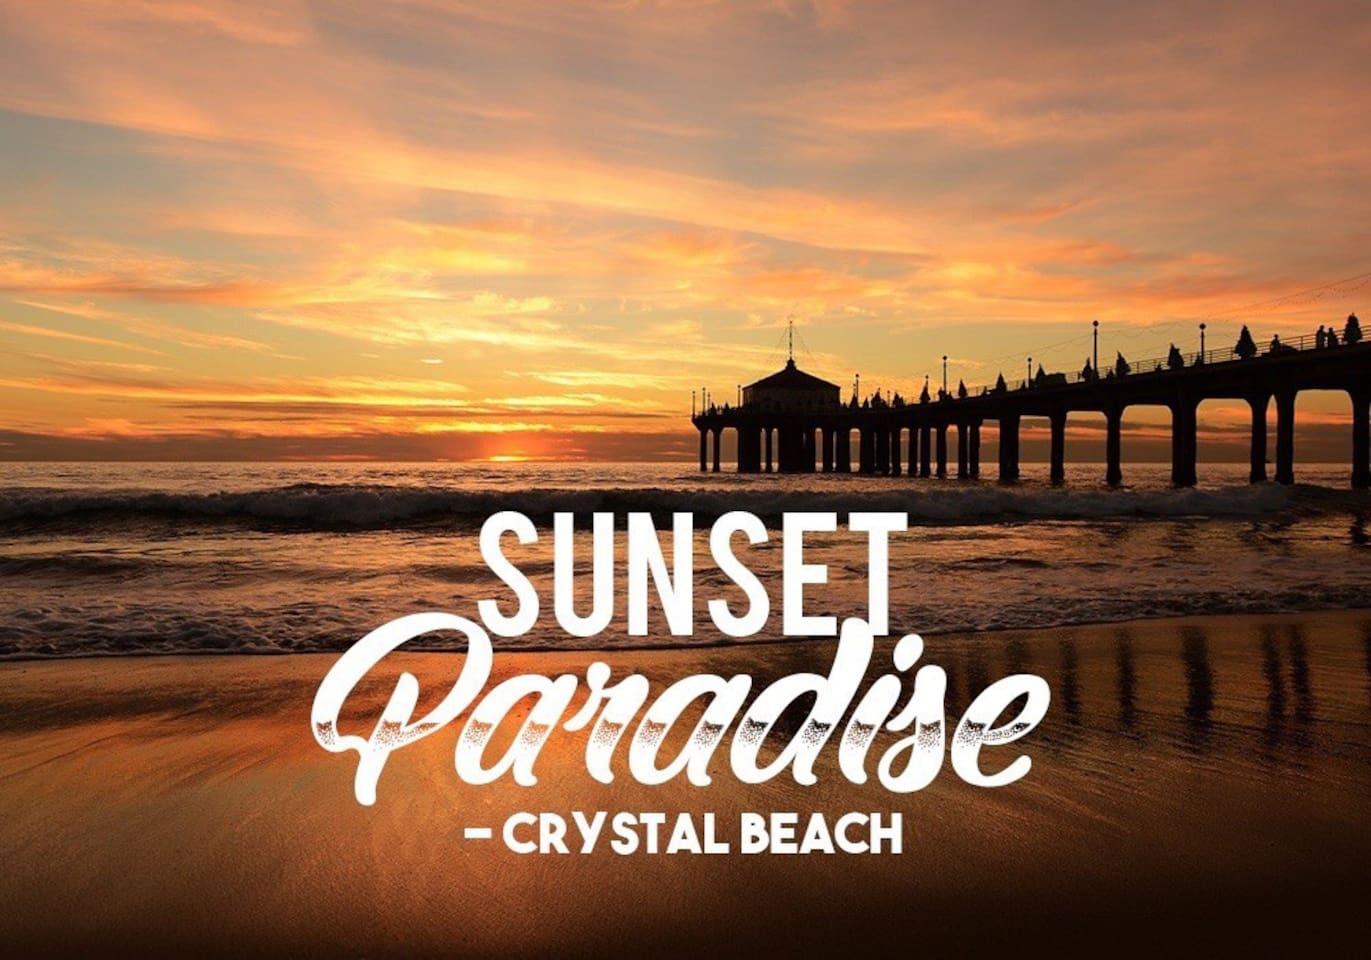 Sunset Paradise - Crystal Beach Getaway Suite.